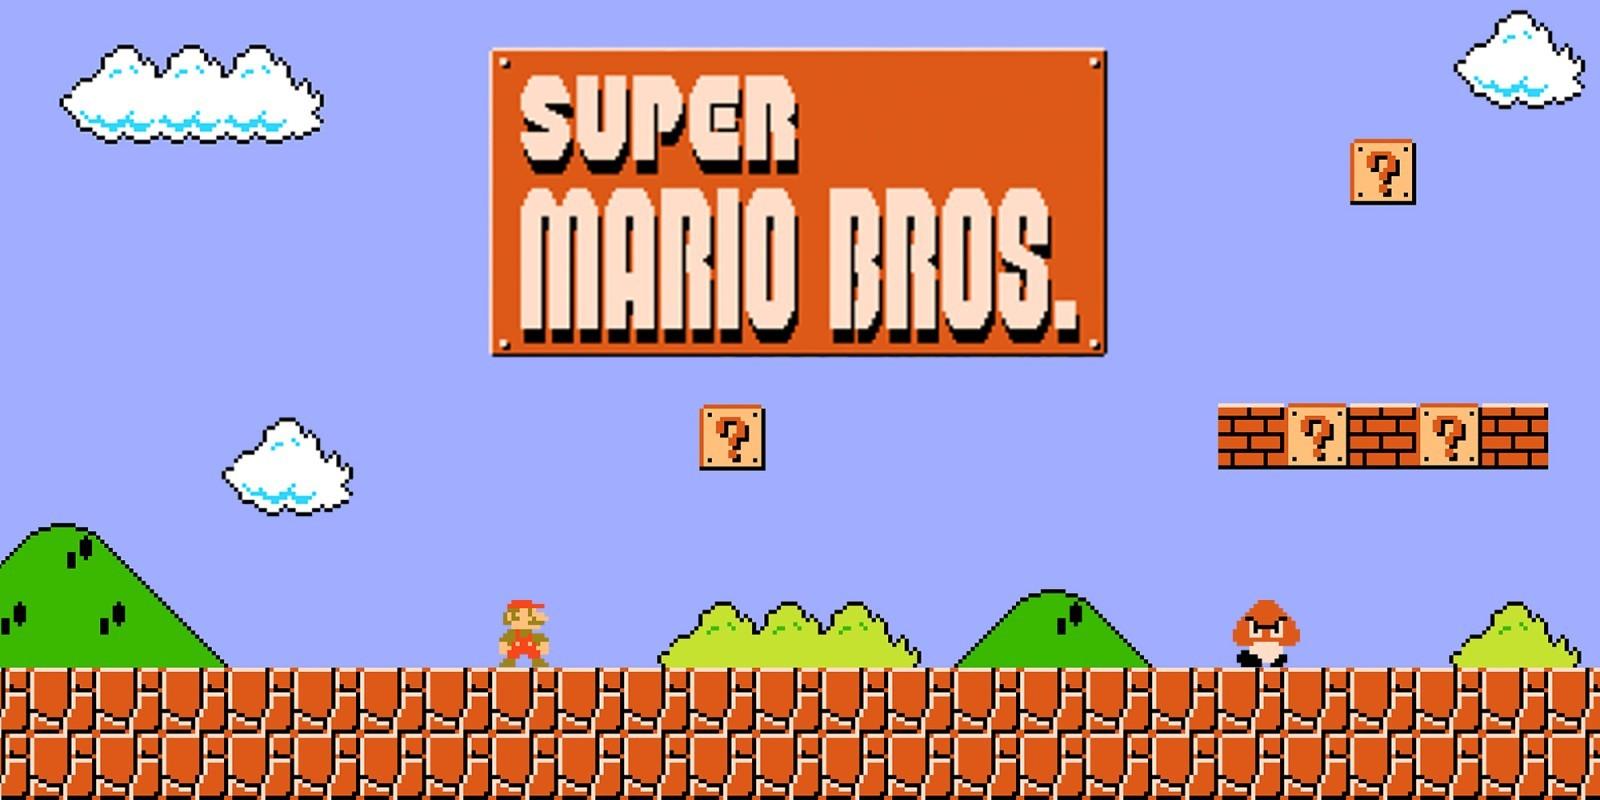 Les jeux de Super Mario Bros